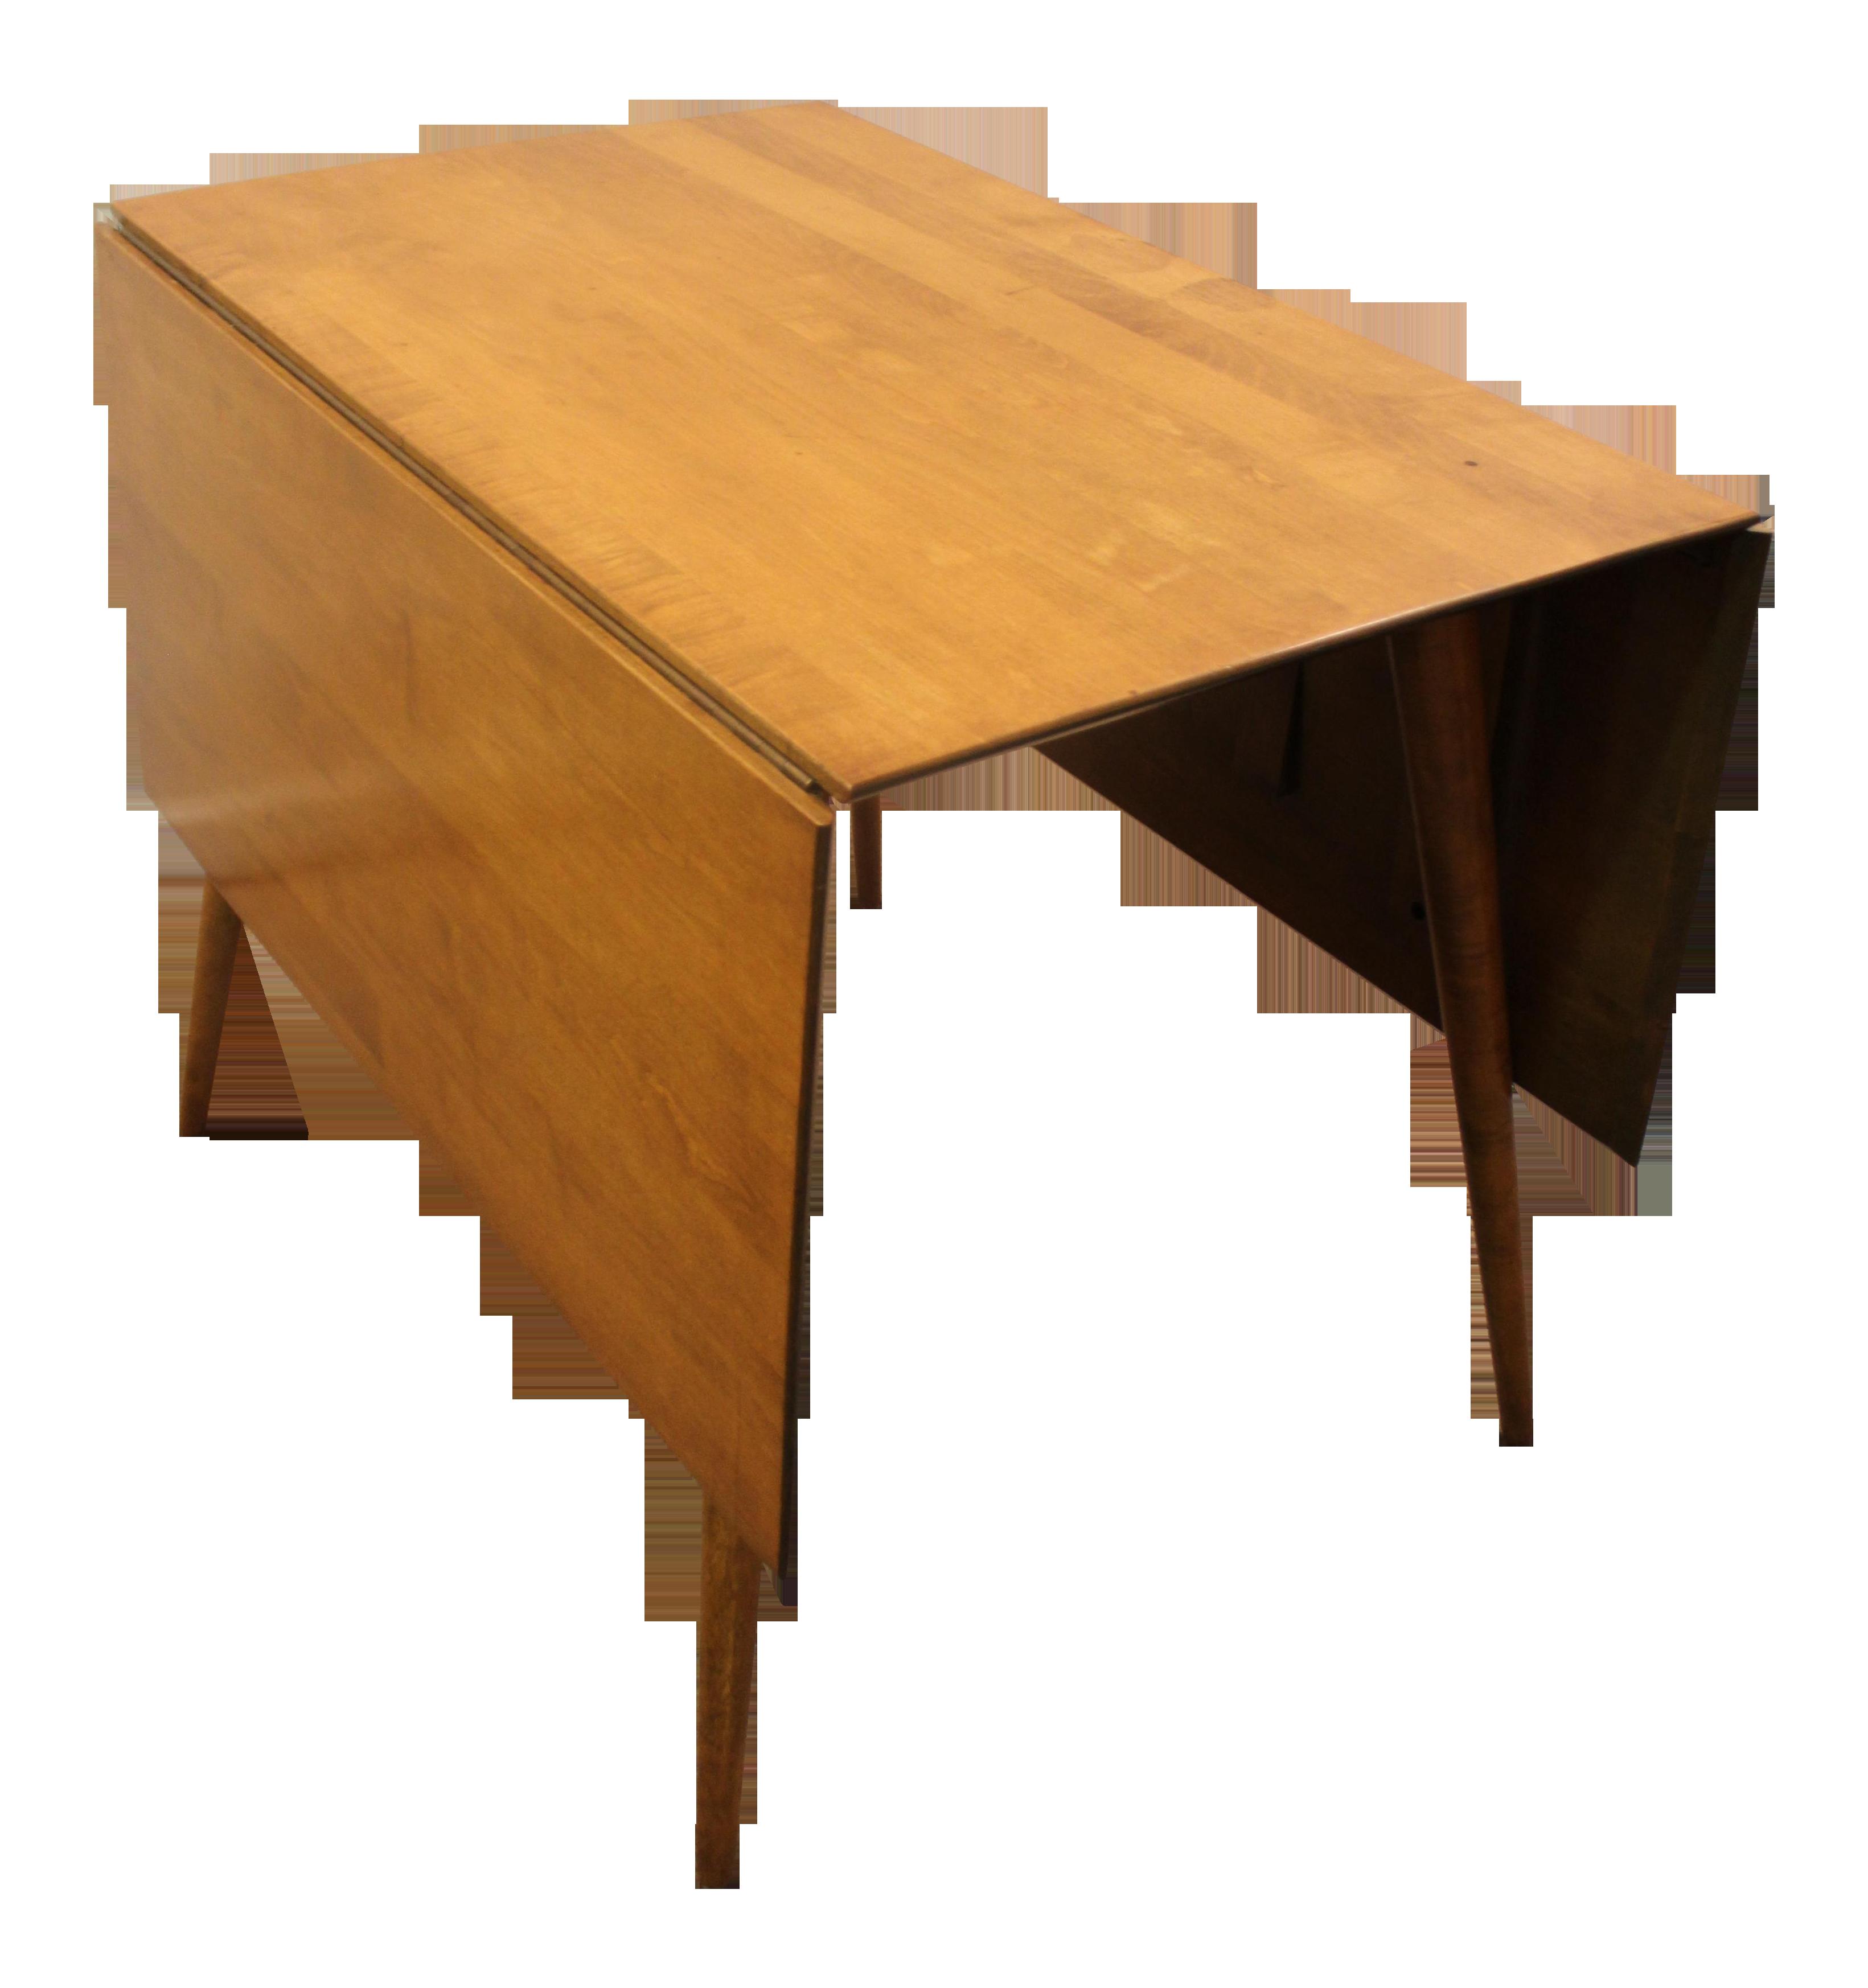 Paul Mccobb Mid Century Modern Drop Leaf Table Drop Leaf Table